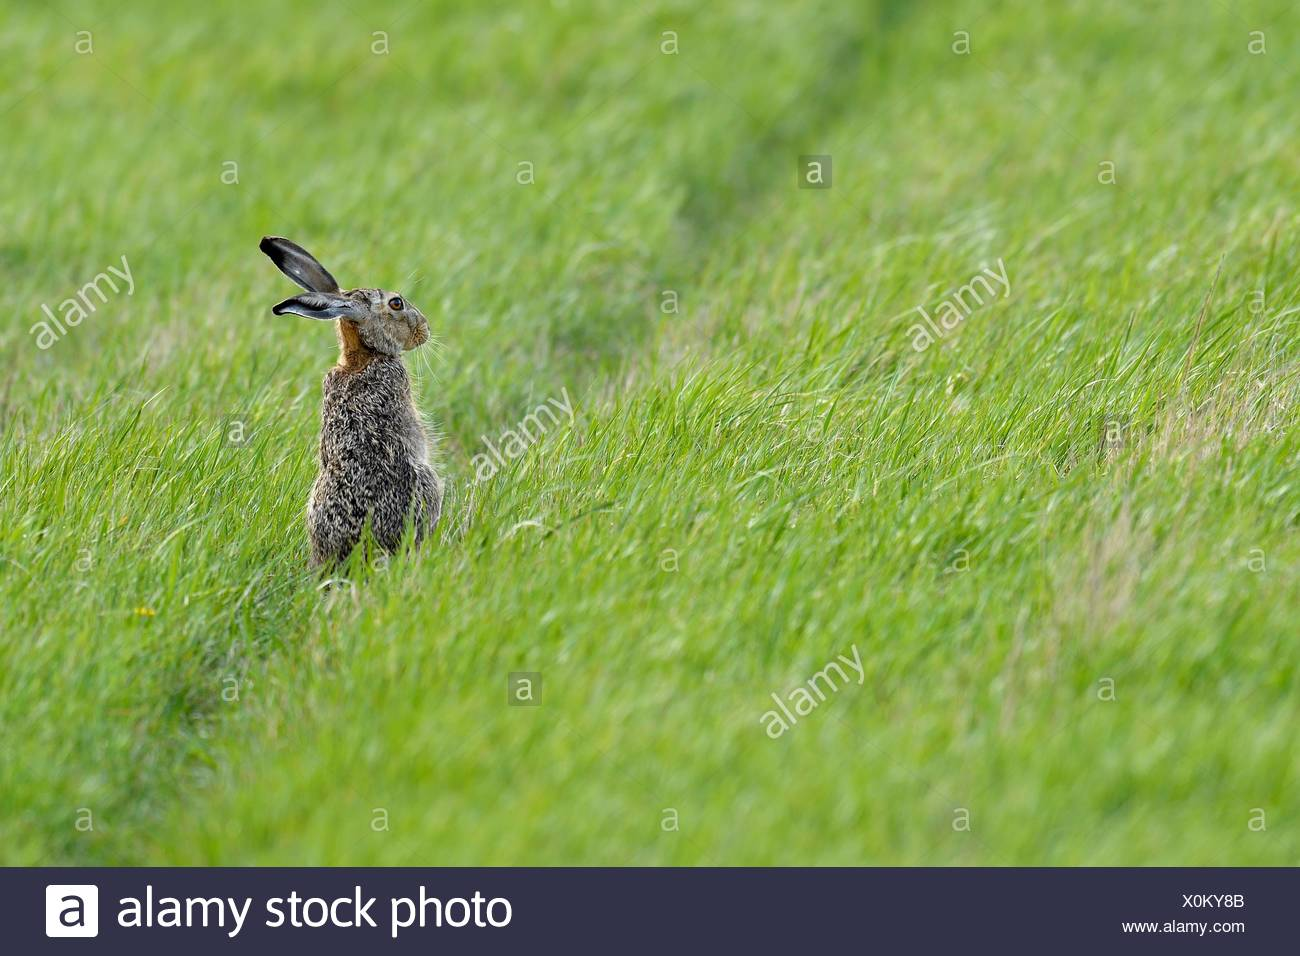 European hare (Lepus europaeus), located in Wiese, Lake Neusiedl National Park, Burgenland, Austria - Stock Image